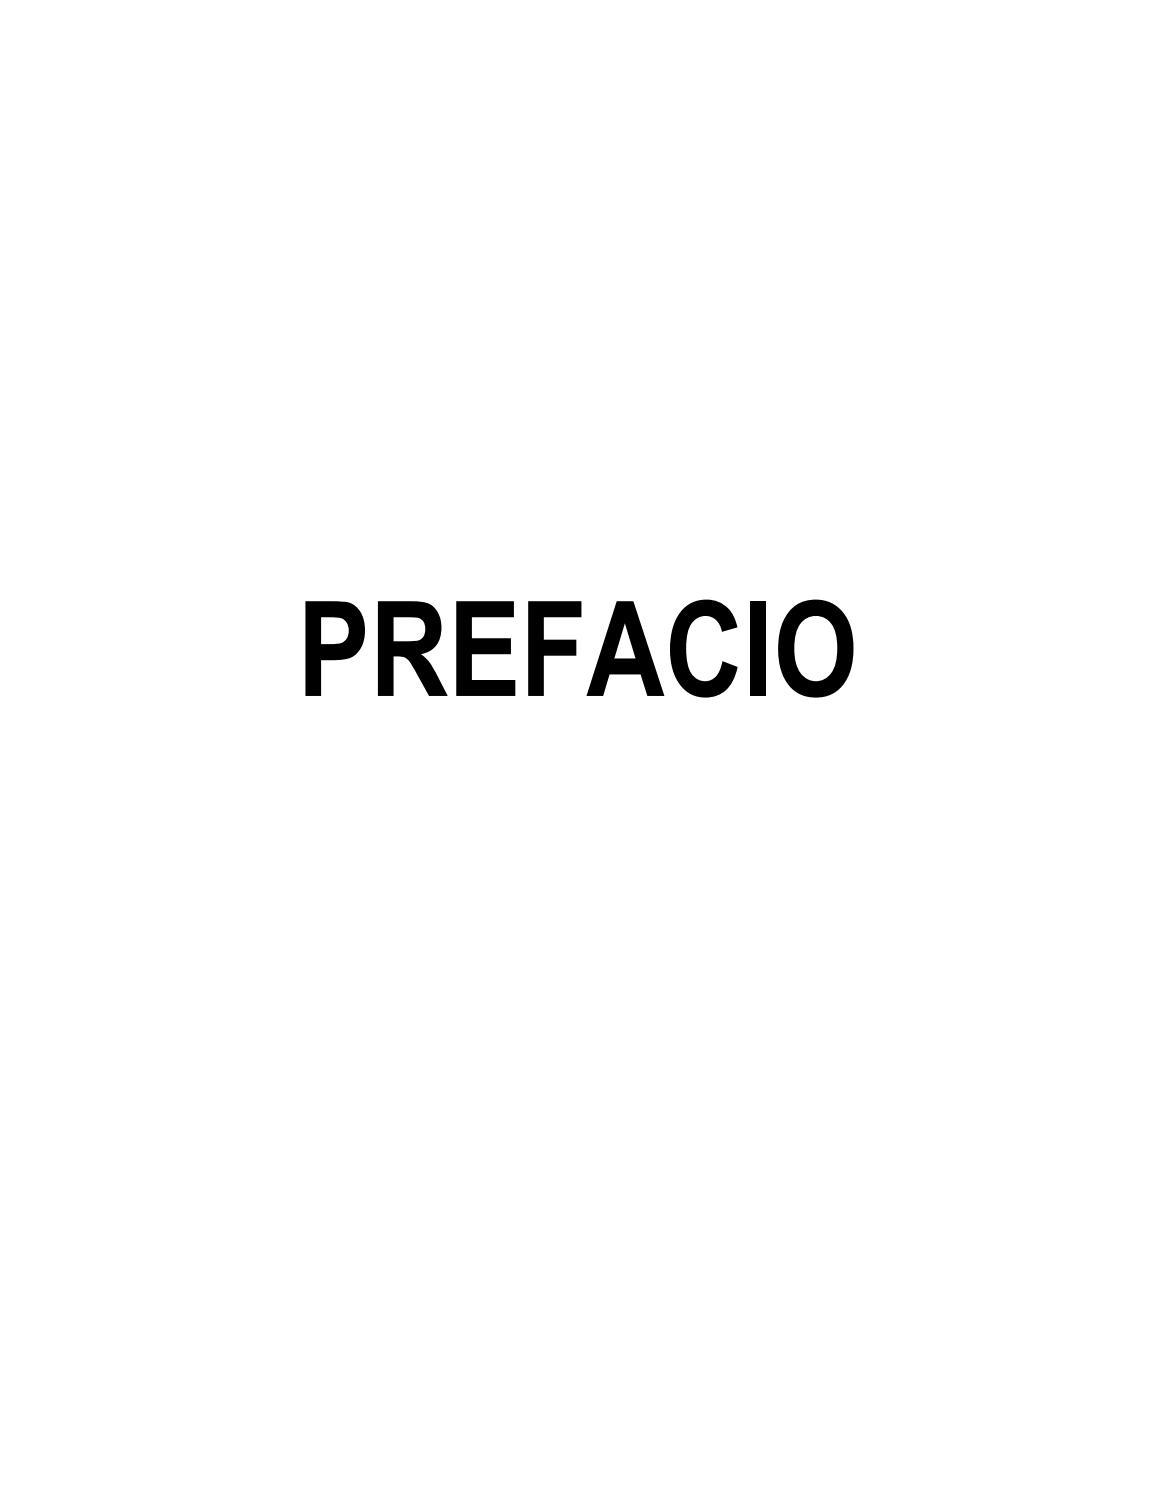 Prefacio\